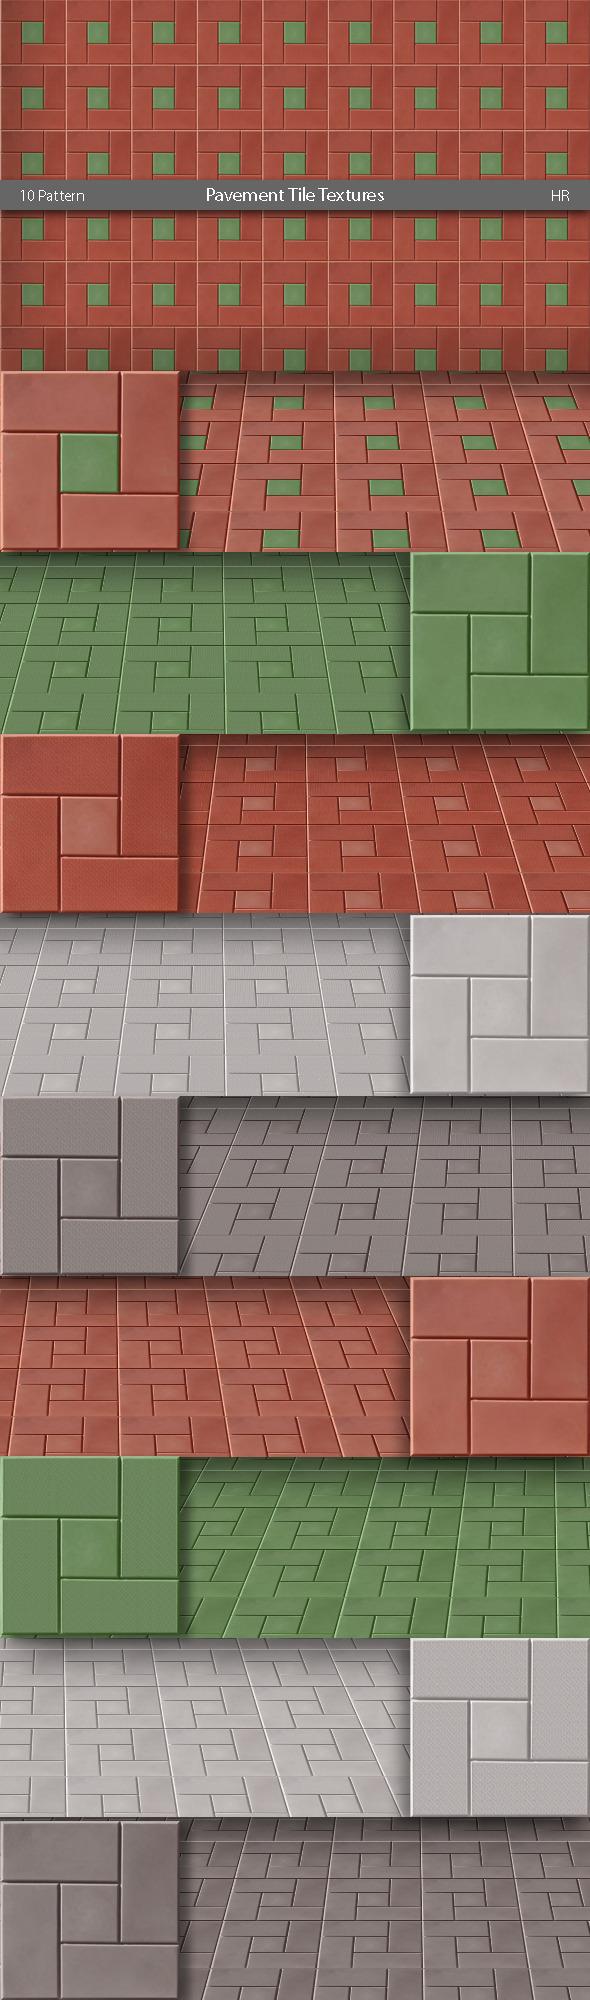 Pavement Tile Patterns - Urban Textures / Fills / Patterns